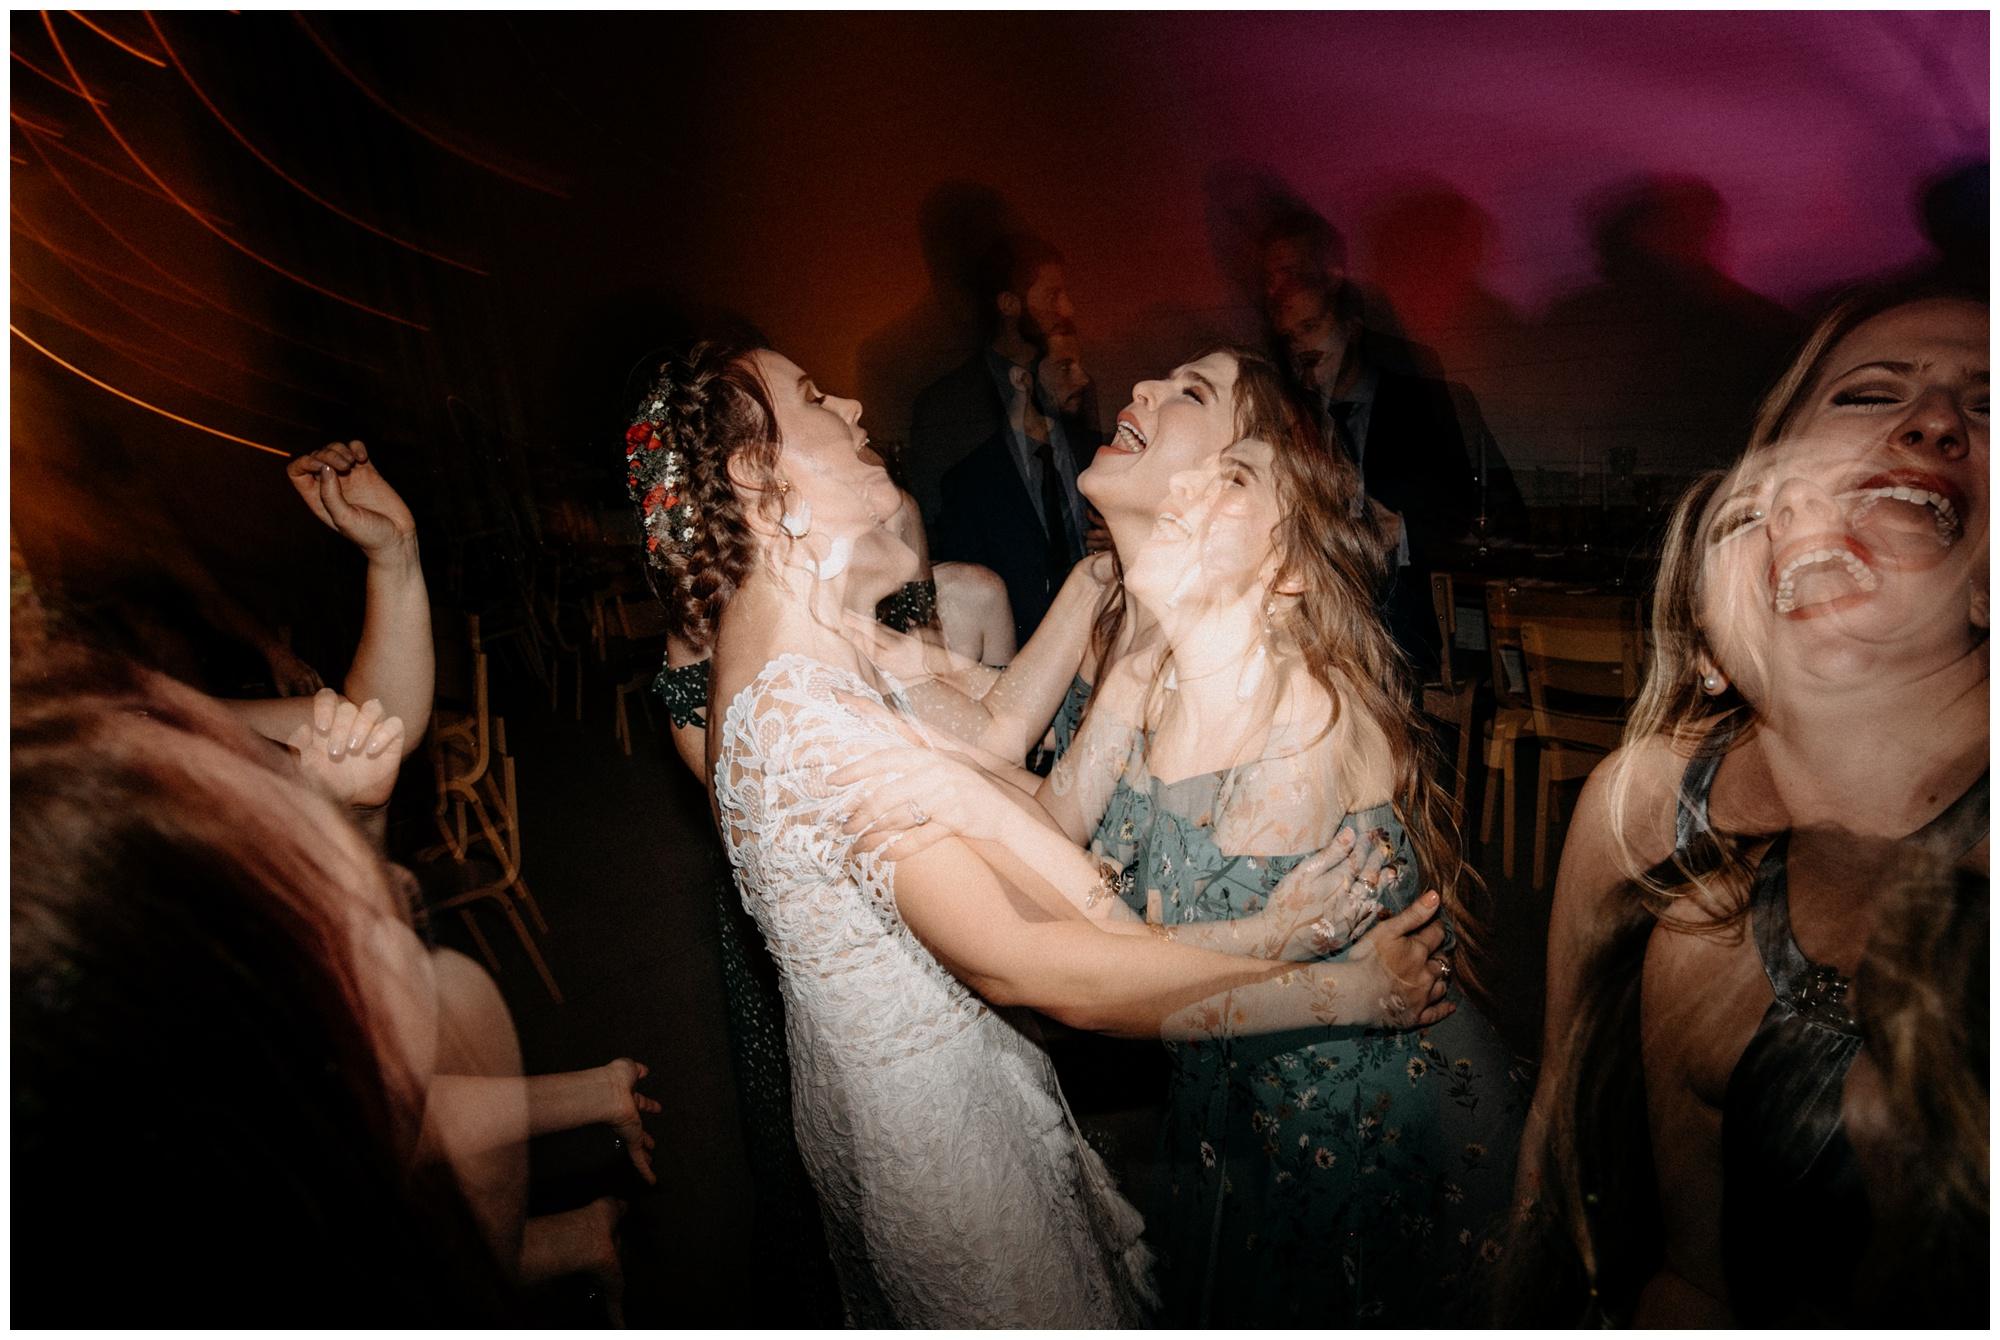 AUSTIN-TEXAS-PROSPECT-HOUSE-WEDDING-VENUE-PHOTOGRAPHY25856.JPG